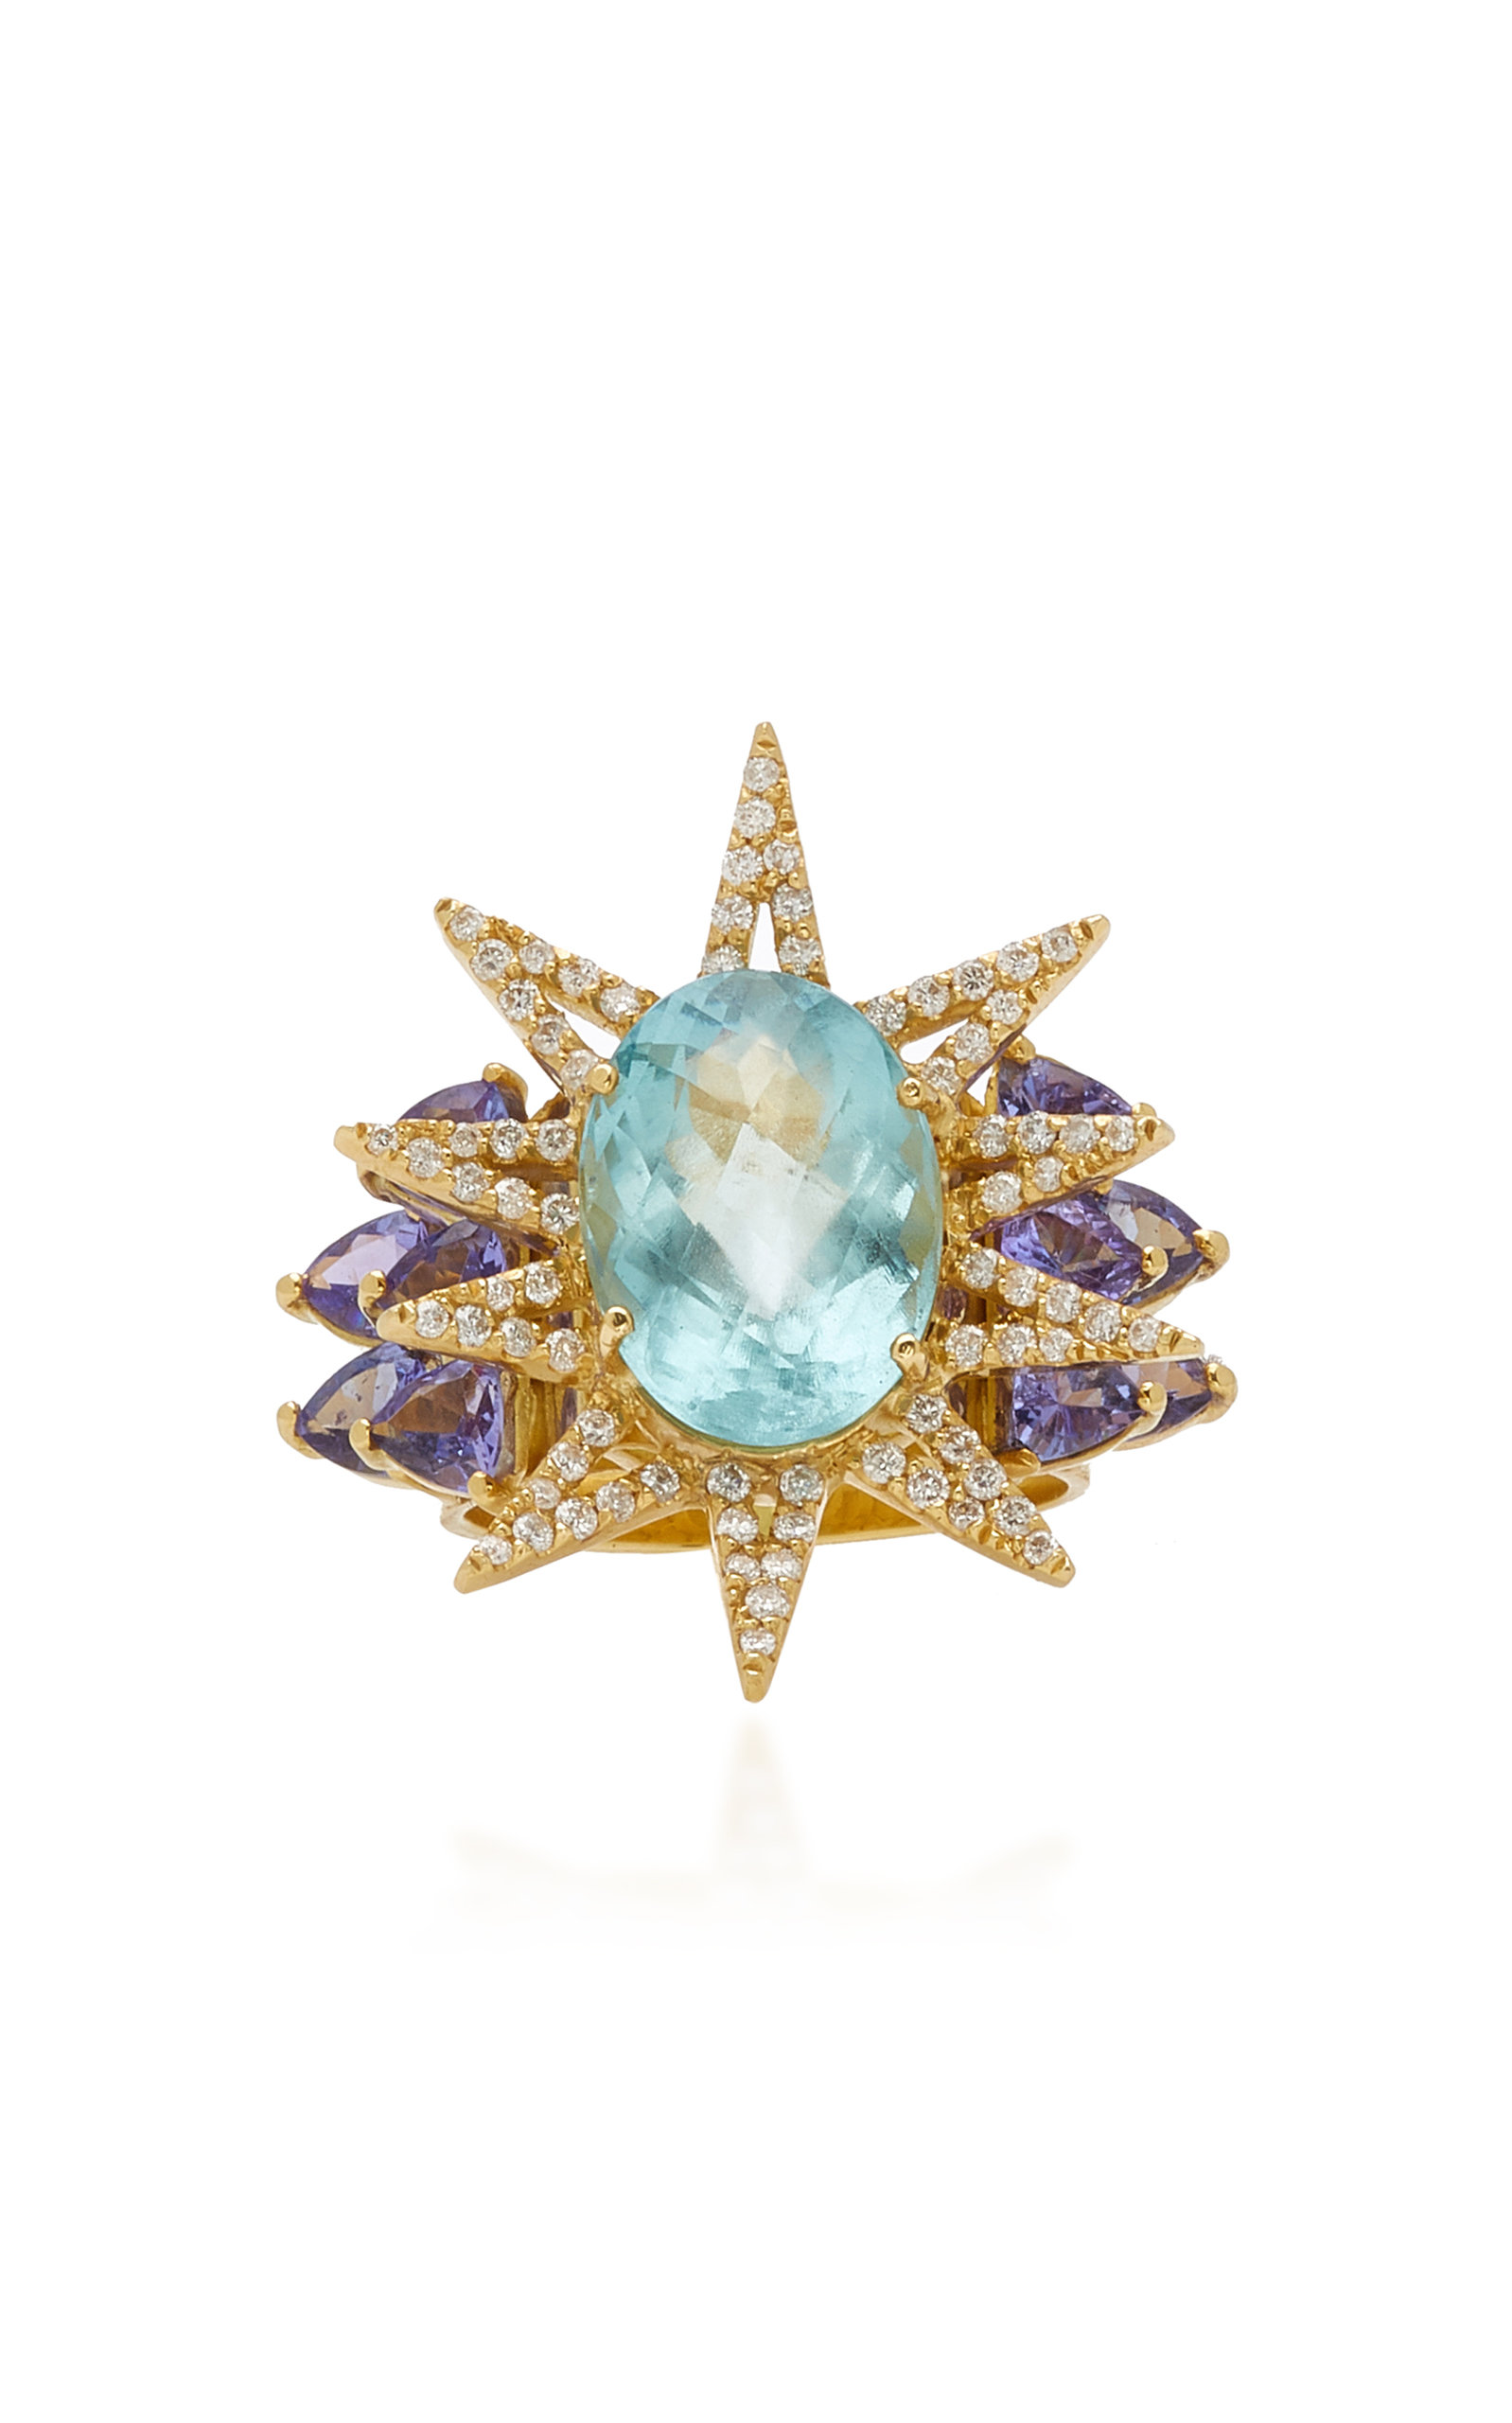 Women's Shine 18K Yellow Gold Multi-Stone Ring